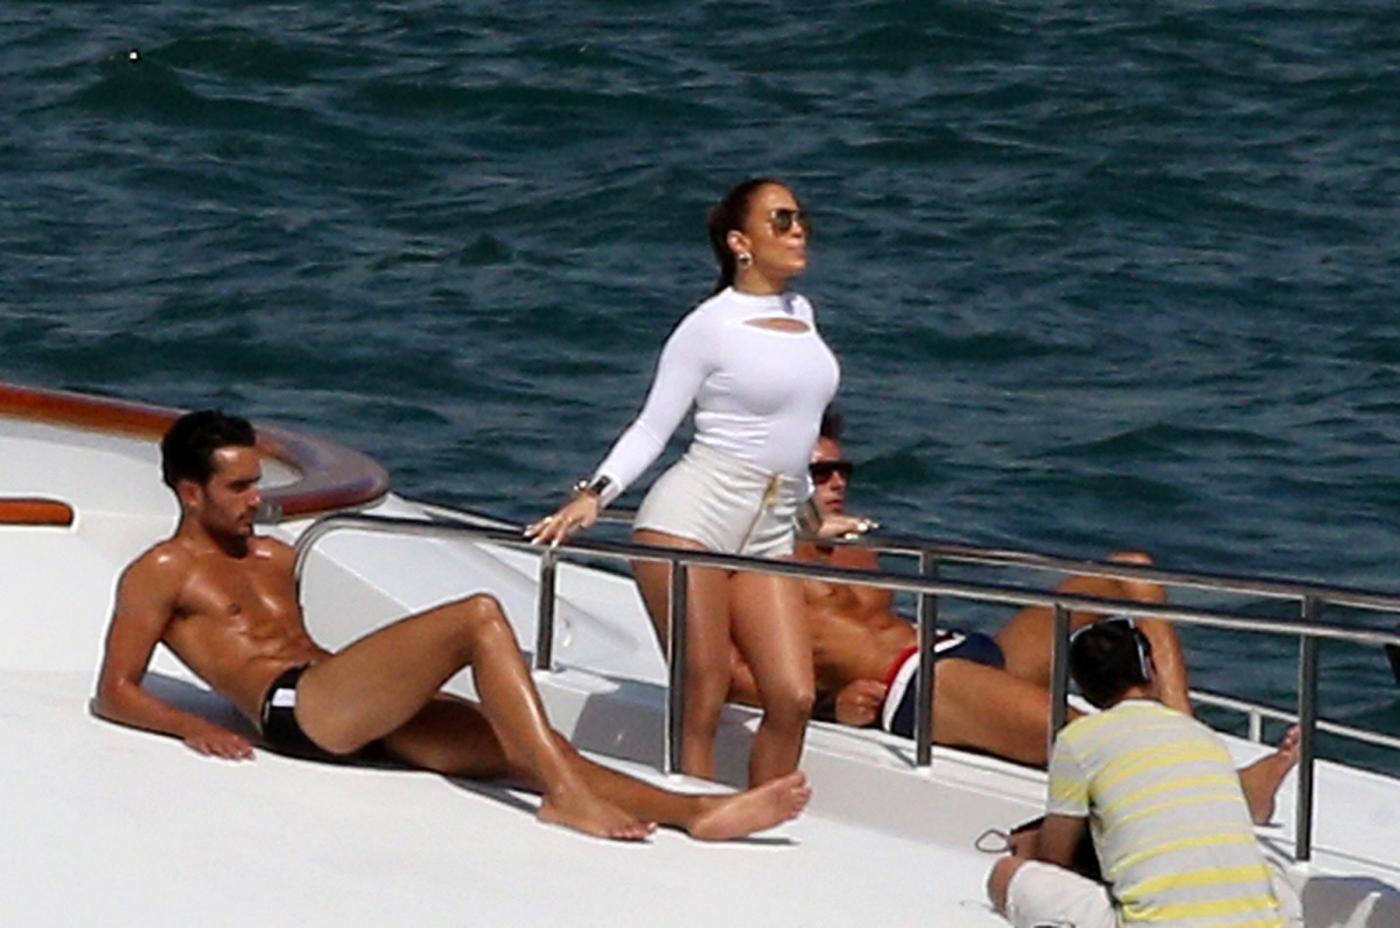 Jennifer Lopez Looks Sexy In White Hot Pants While Filming A Music Video In Miami Jennifer Lopez su uno yacht di lusso a Miami05